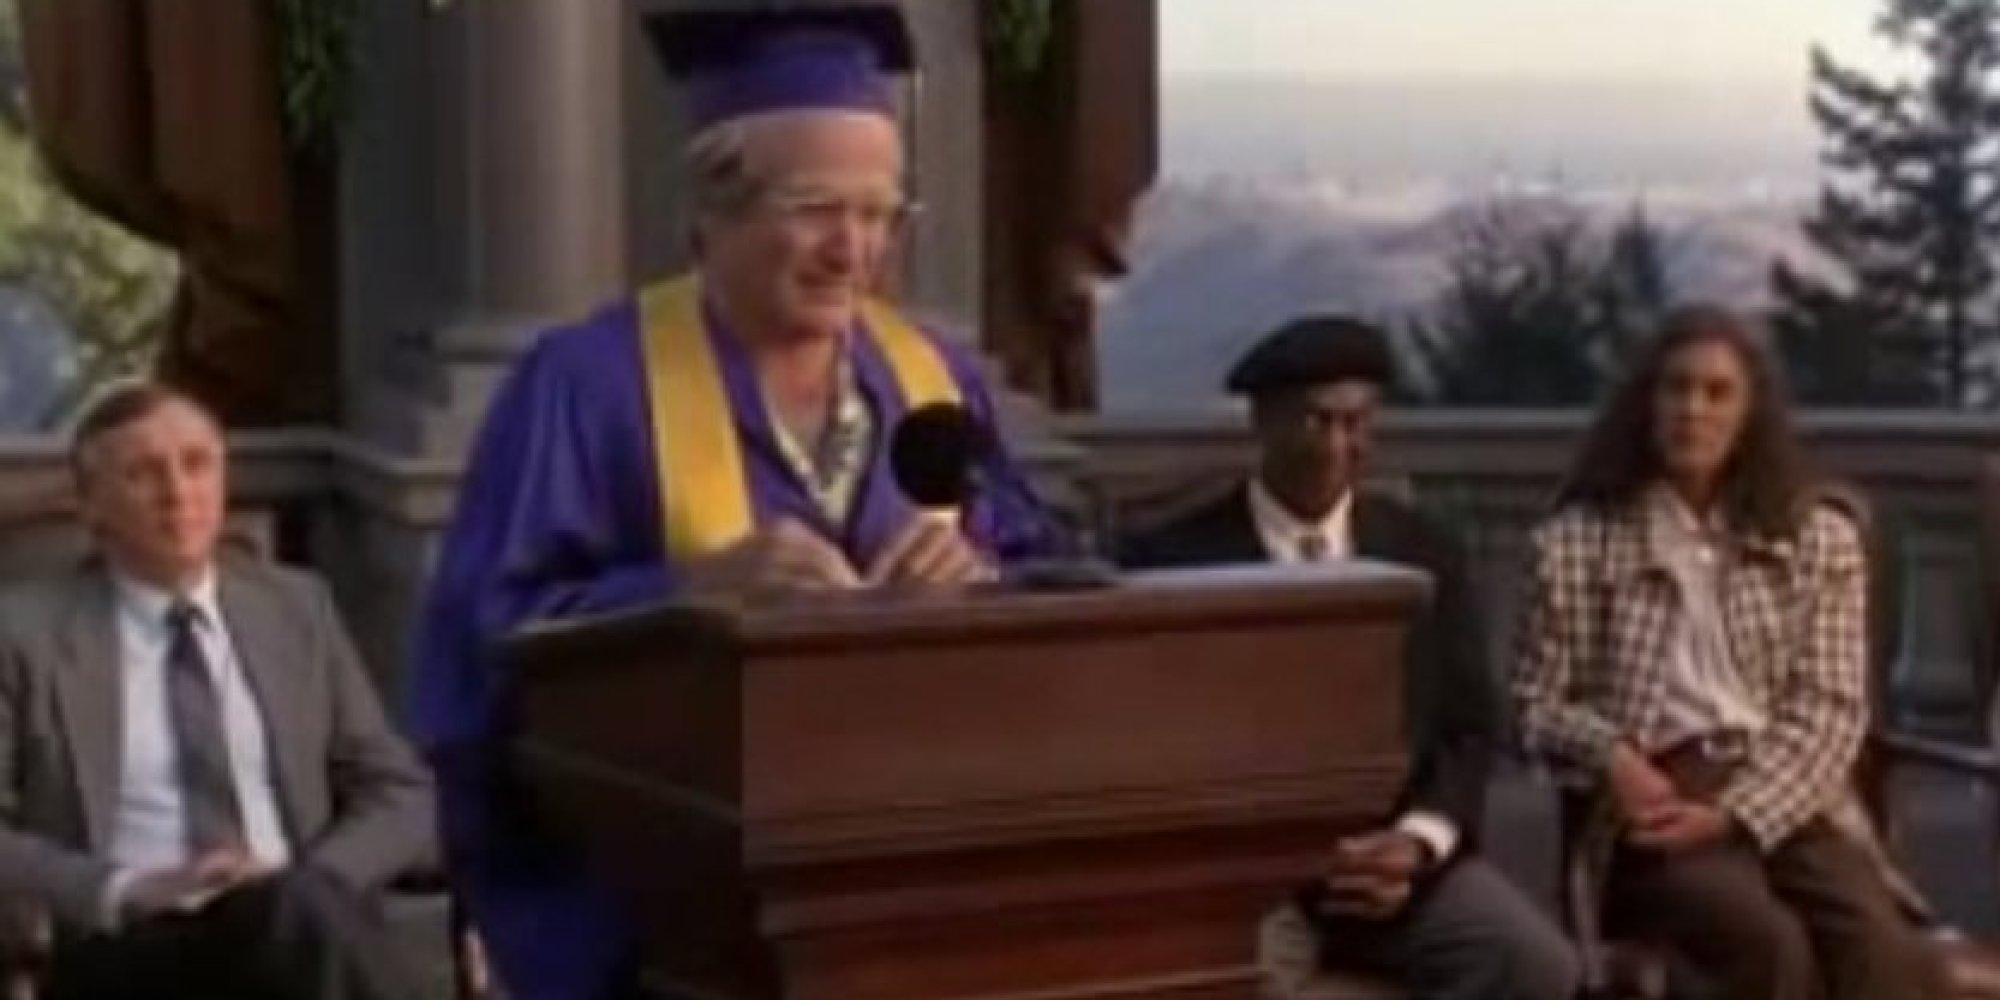 A graduation speech dedicated to generation 2015